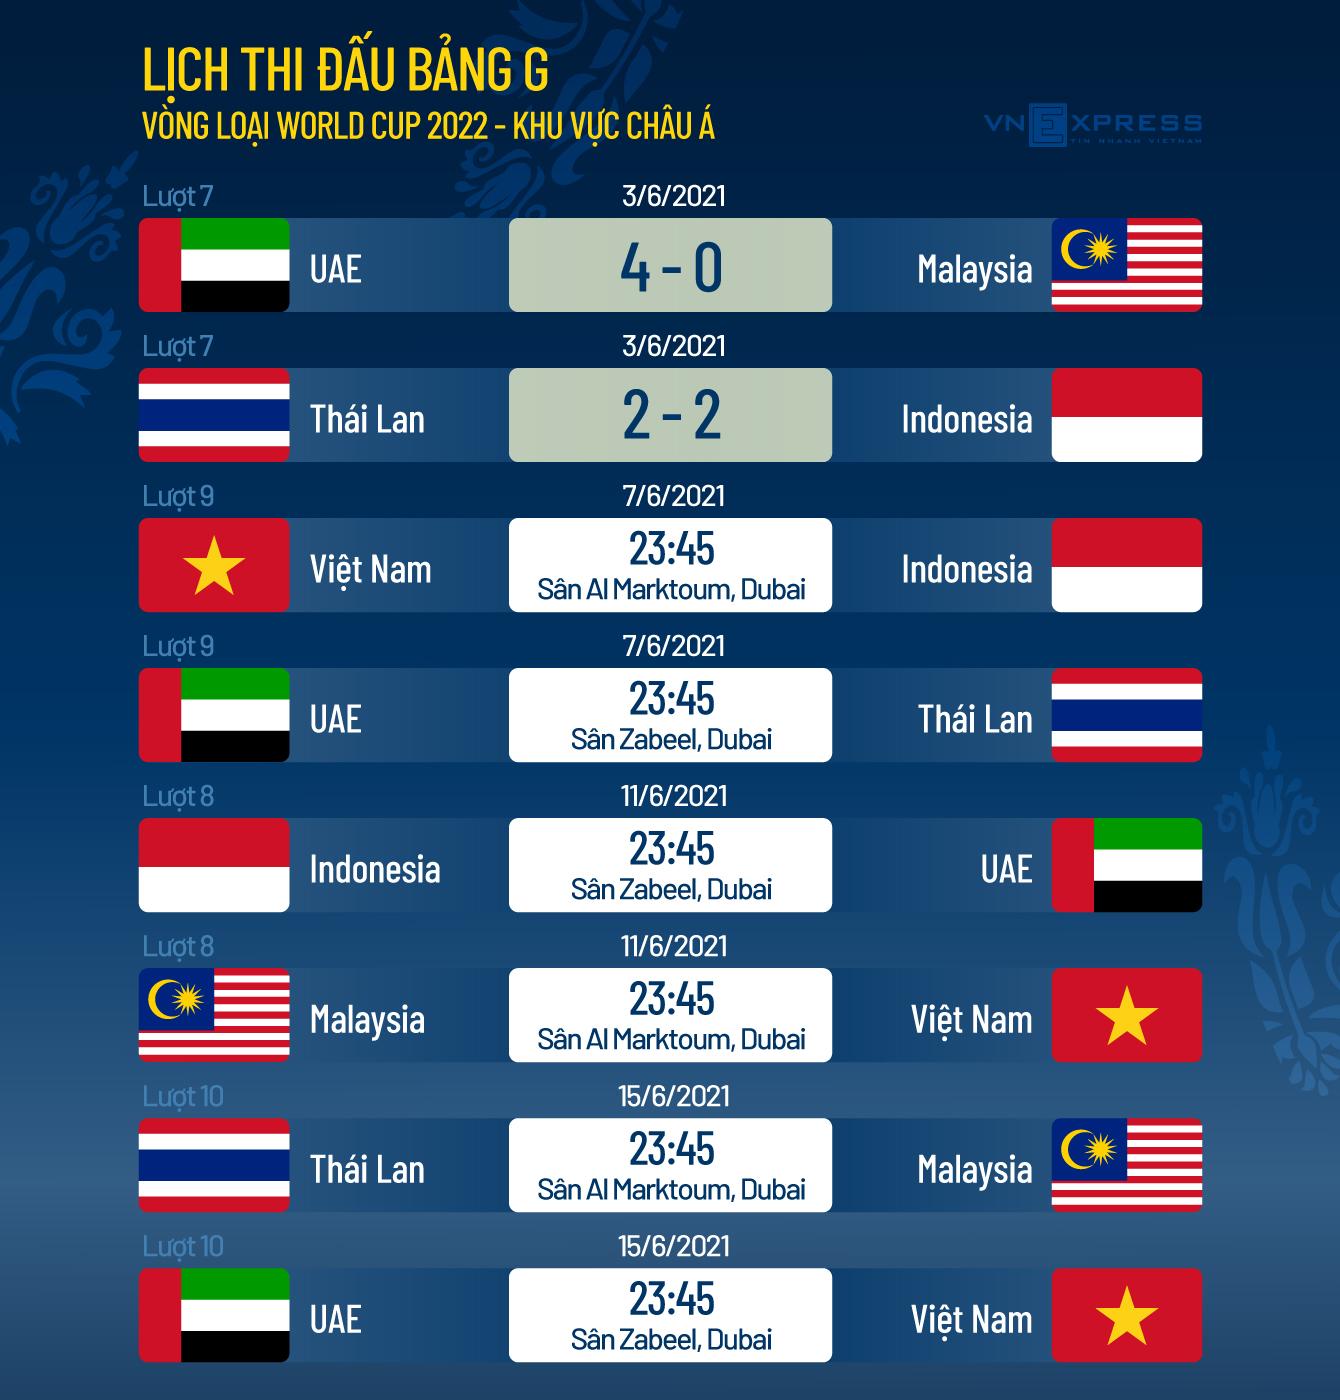 Que Ngoc Hai: ไม่แน่ใจว่าอินโดนีเซียเล่นง่ายกว่ามาเลเซียหรือสหรัฐอาหรับเอมิเรตส์ - 2